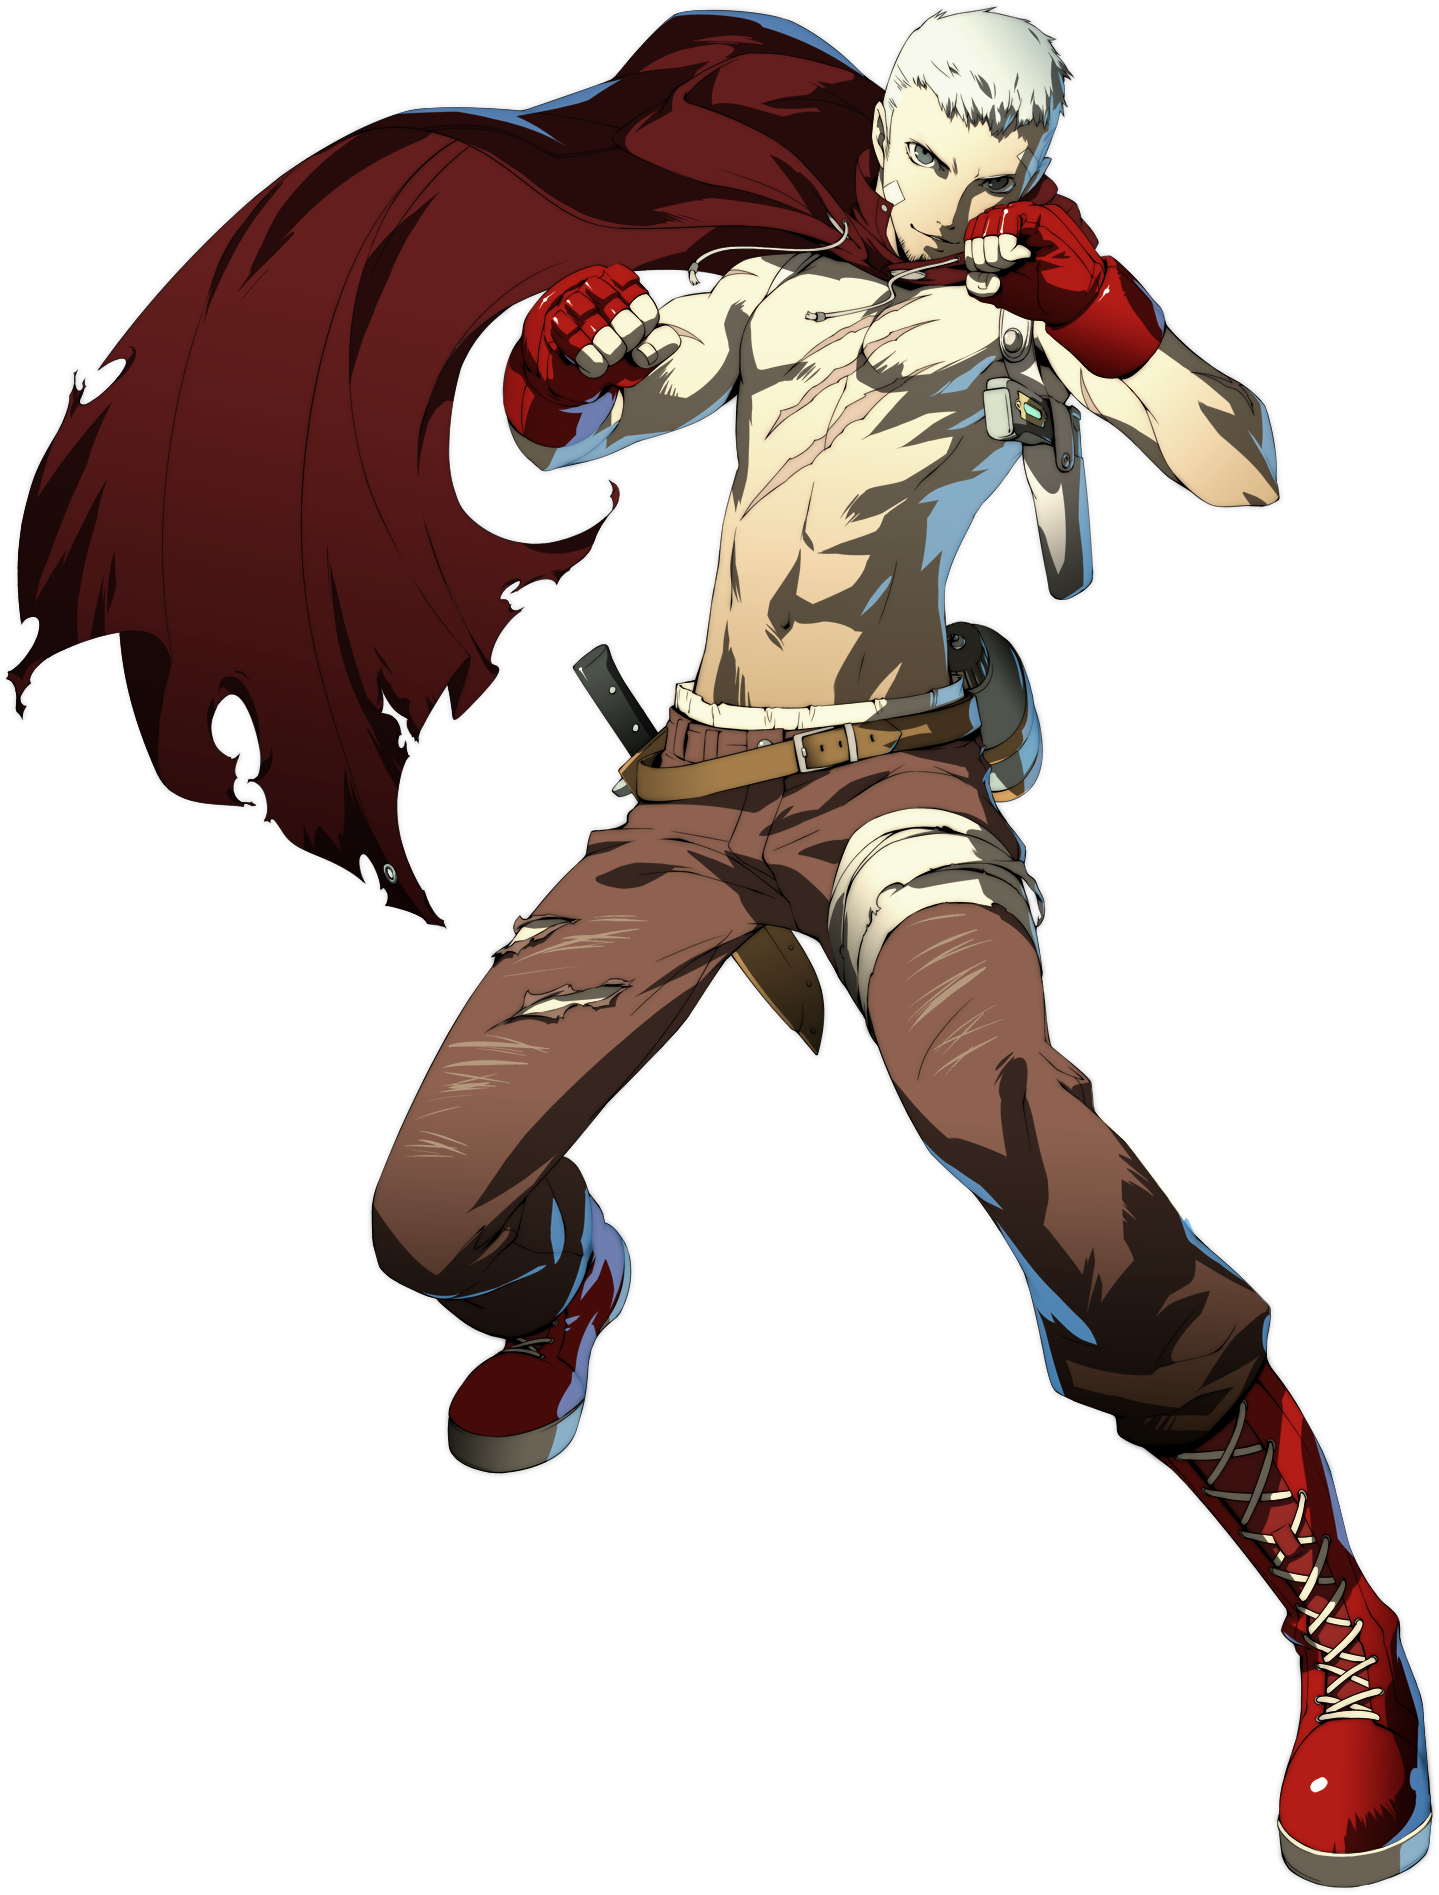 Persona male characters